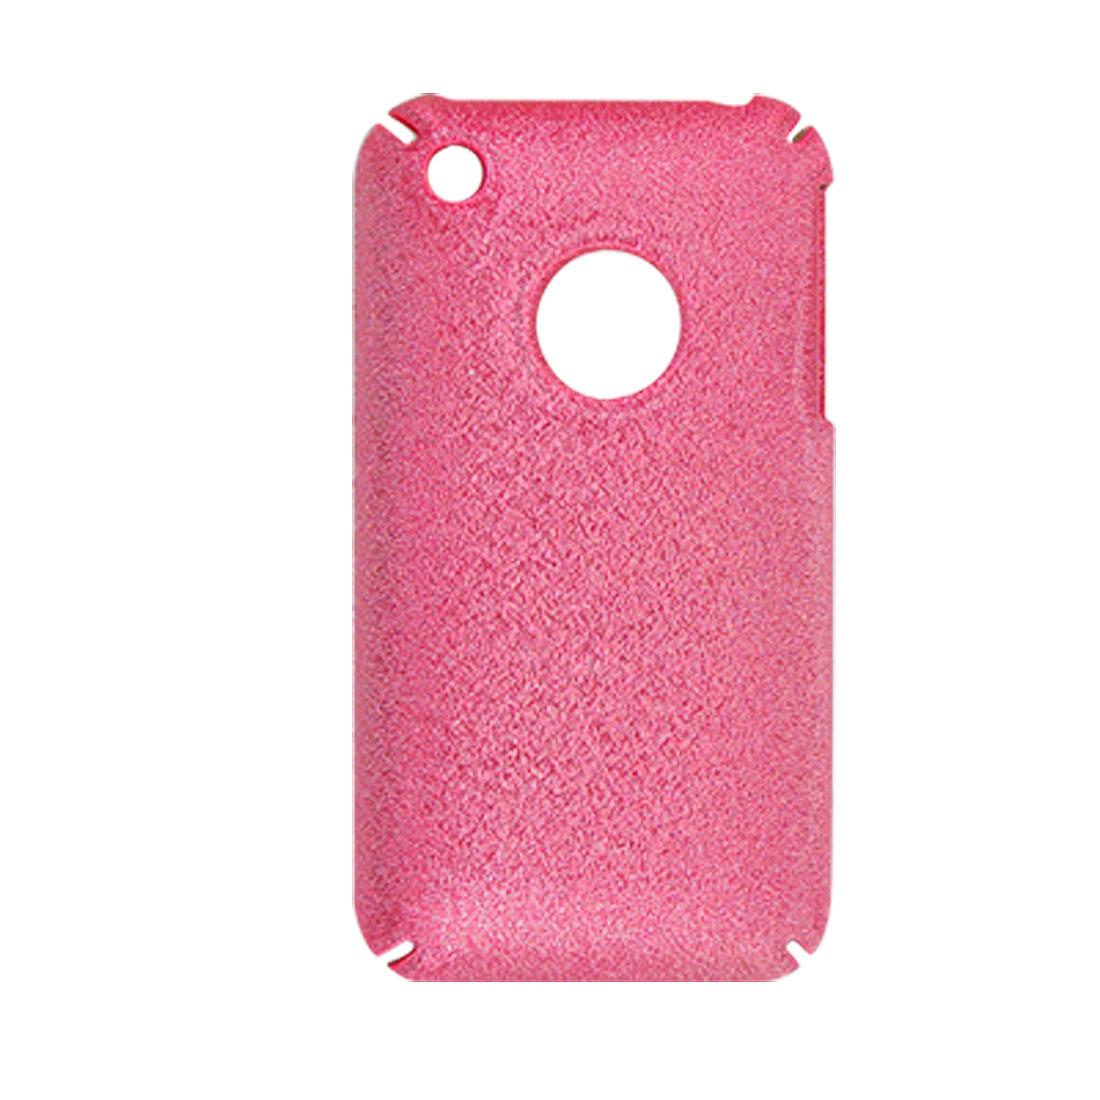 Fit iPhone 3GS Glittery Hard Plastic Back Case Sheild